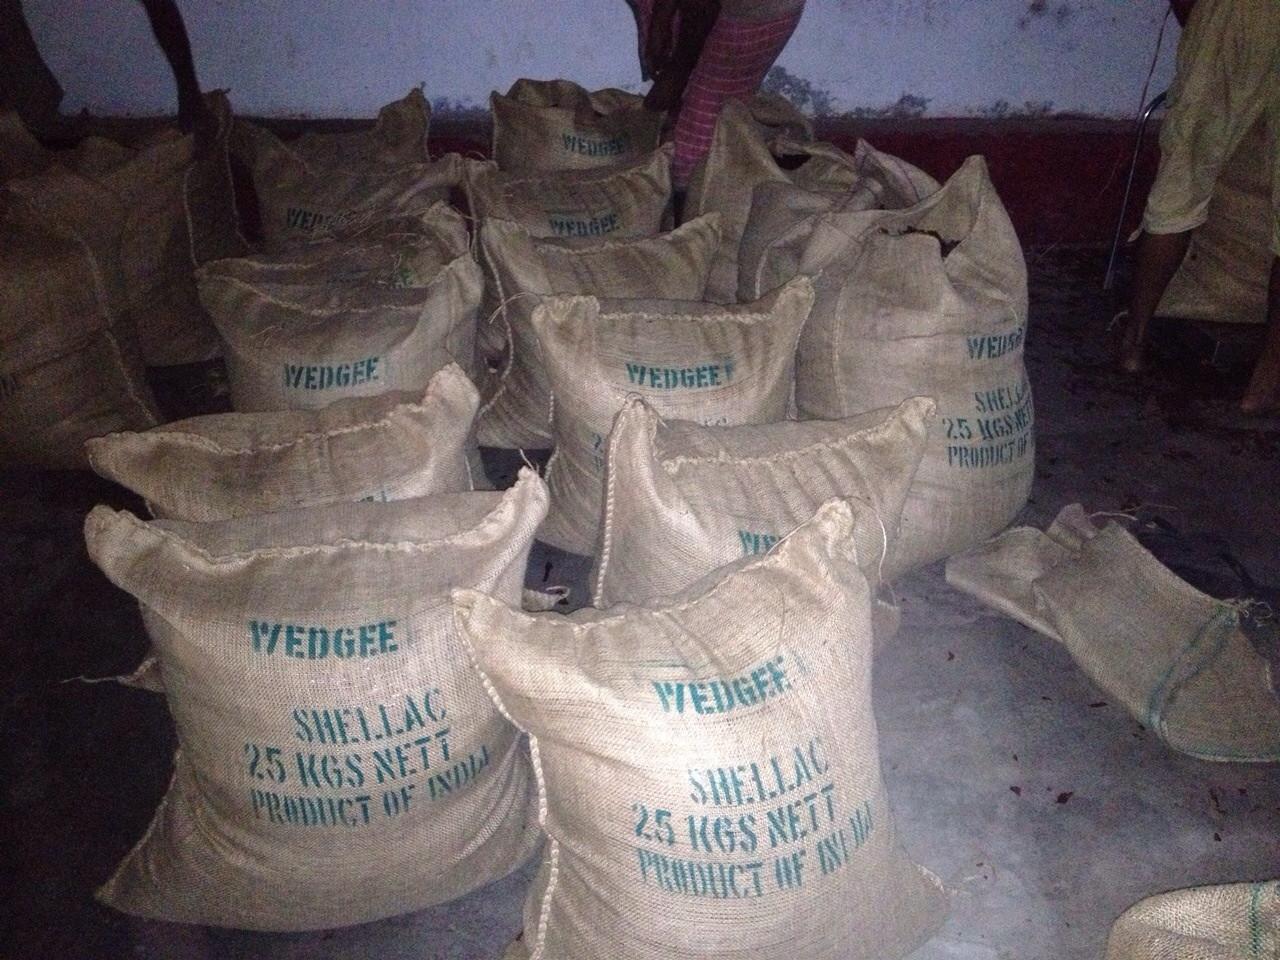 Wedge Shellac Factory India3.jpg